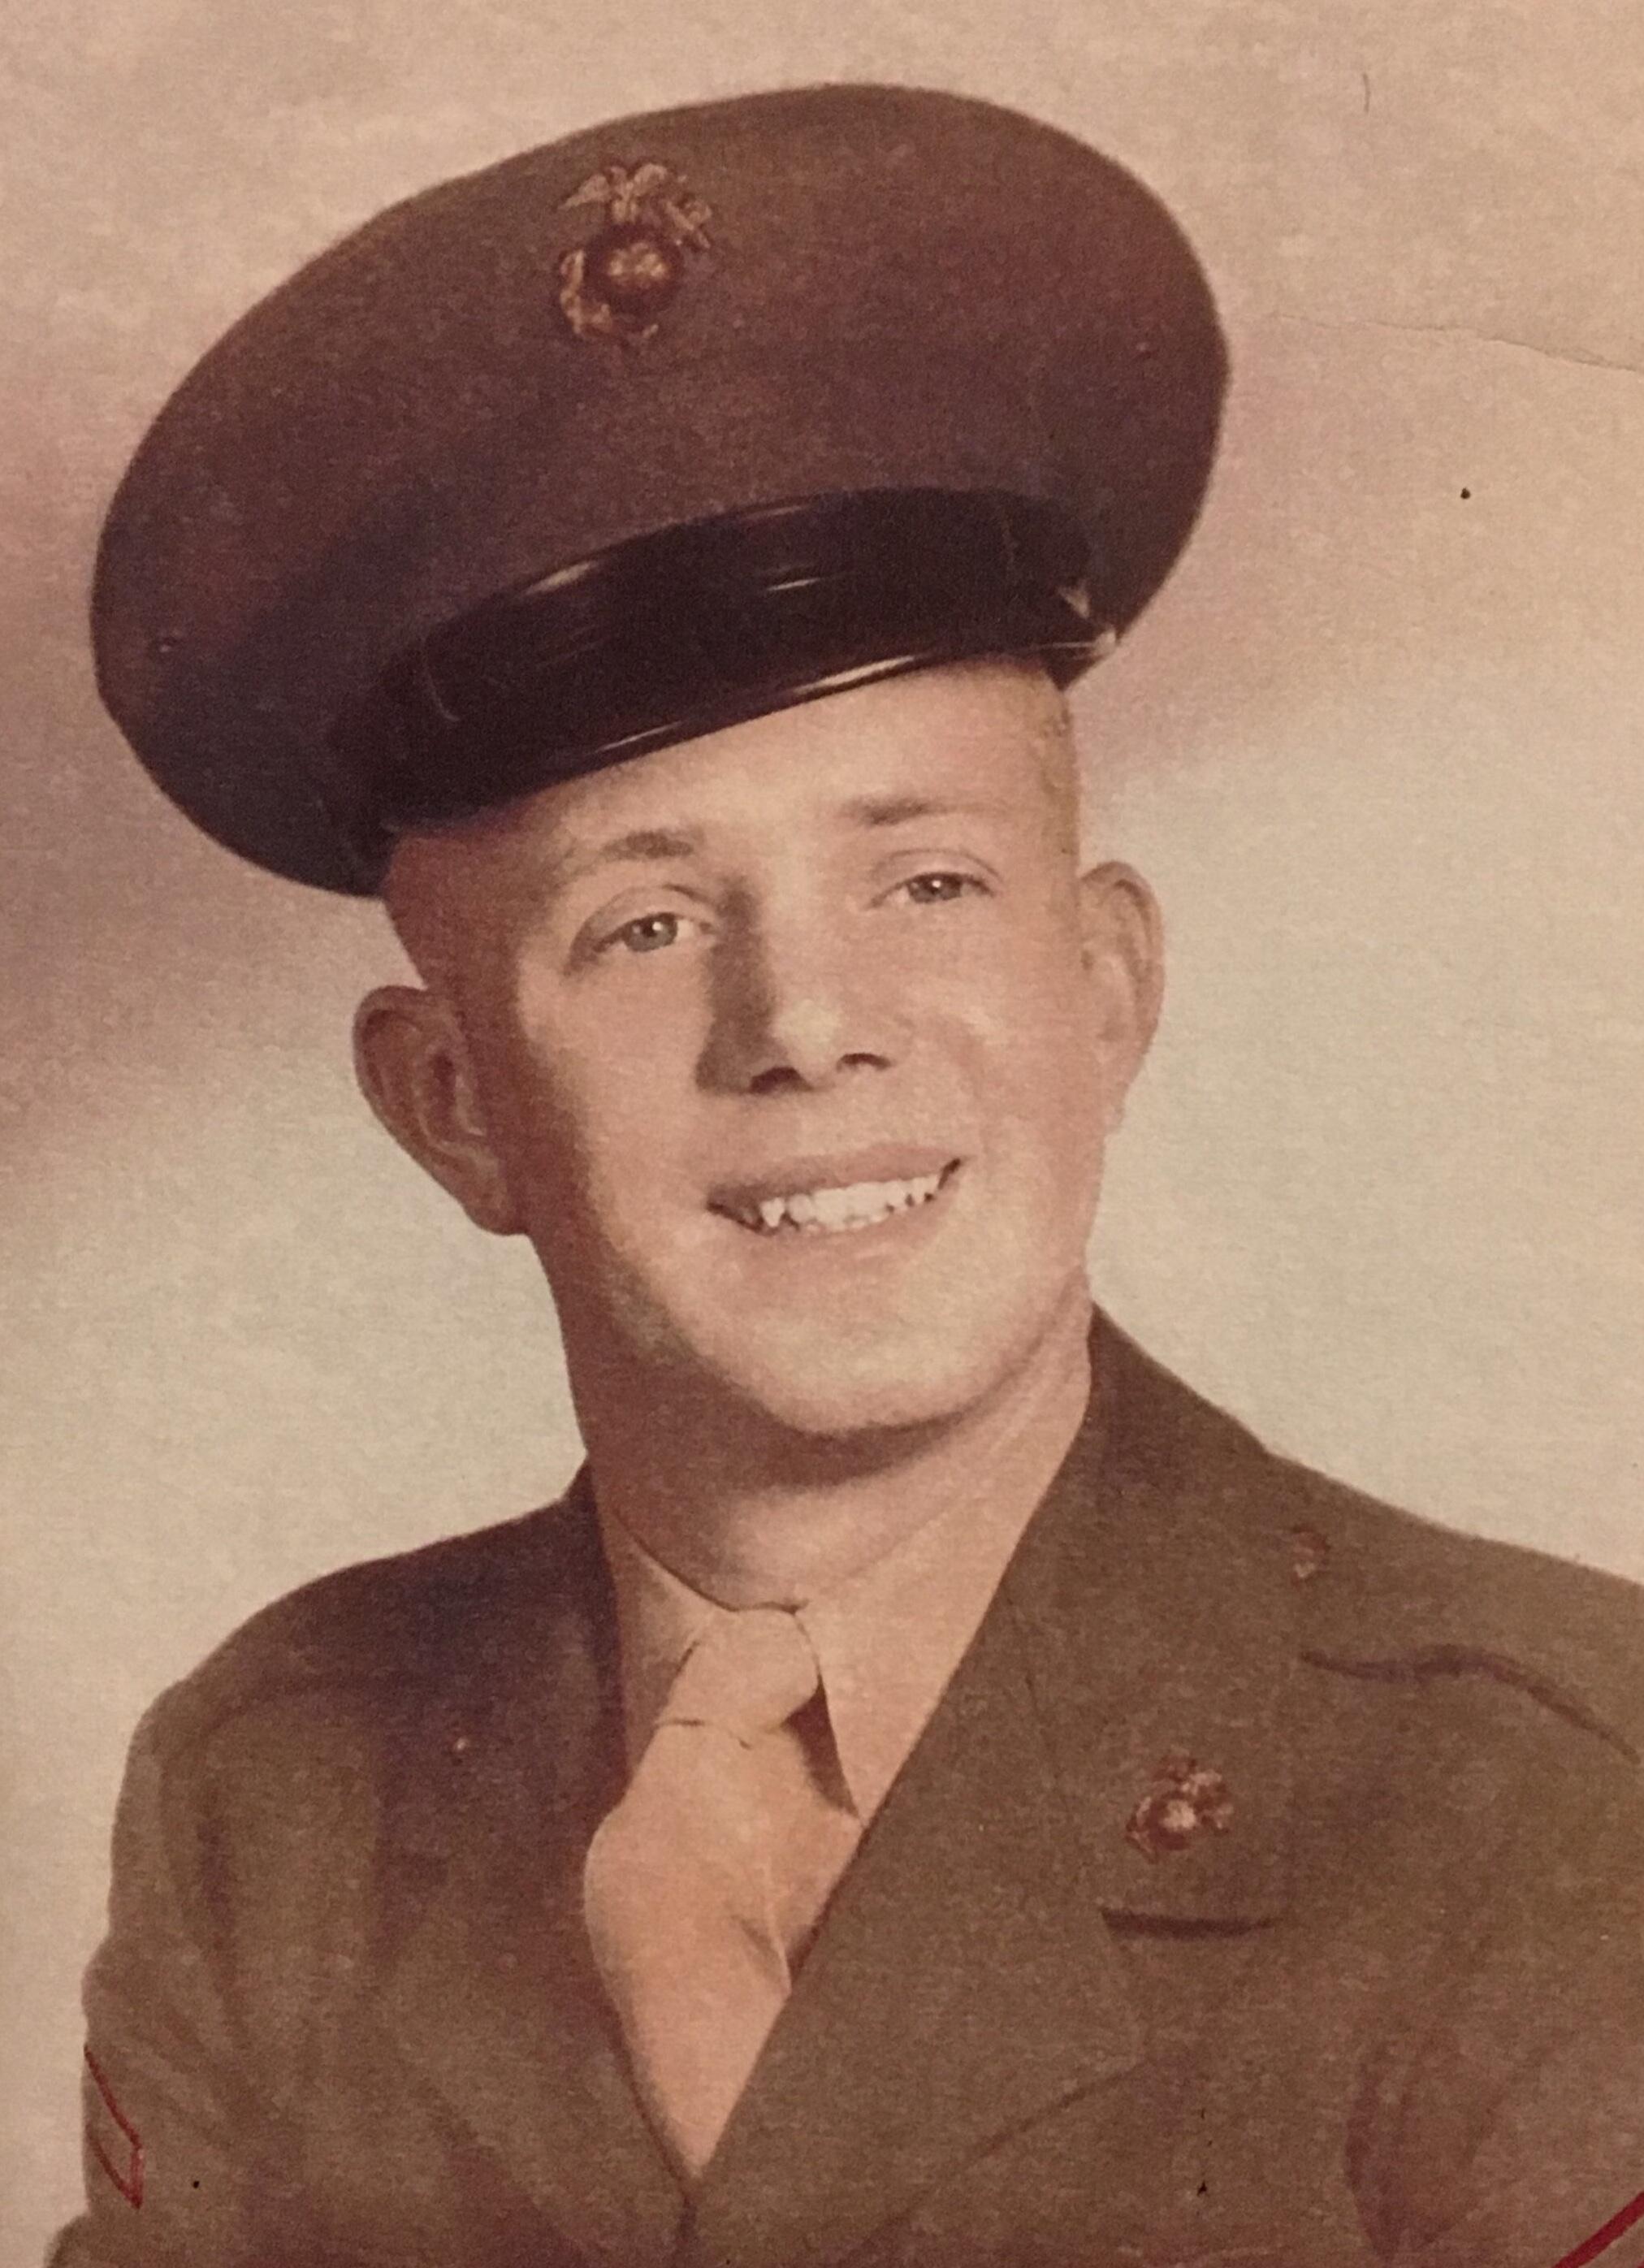 Grant Powell - Korea - USMC